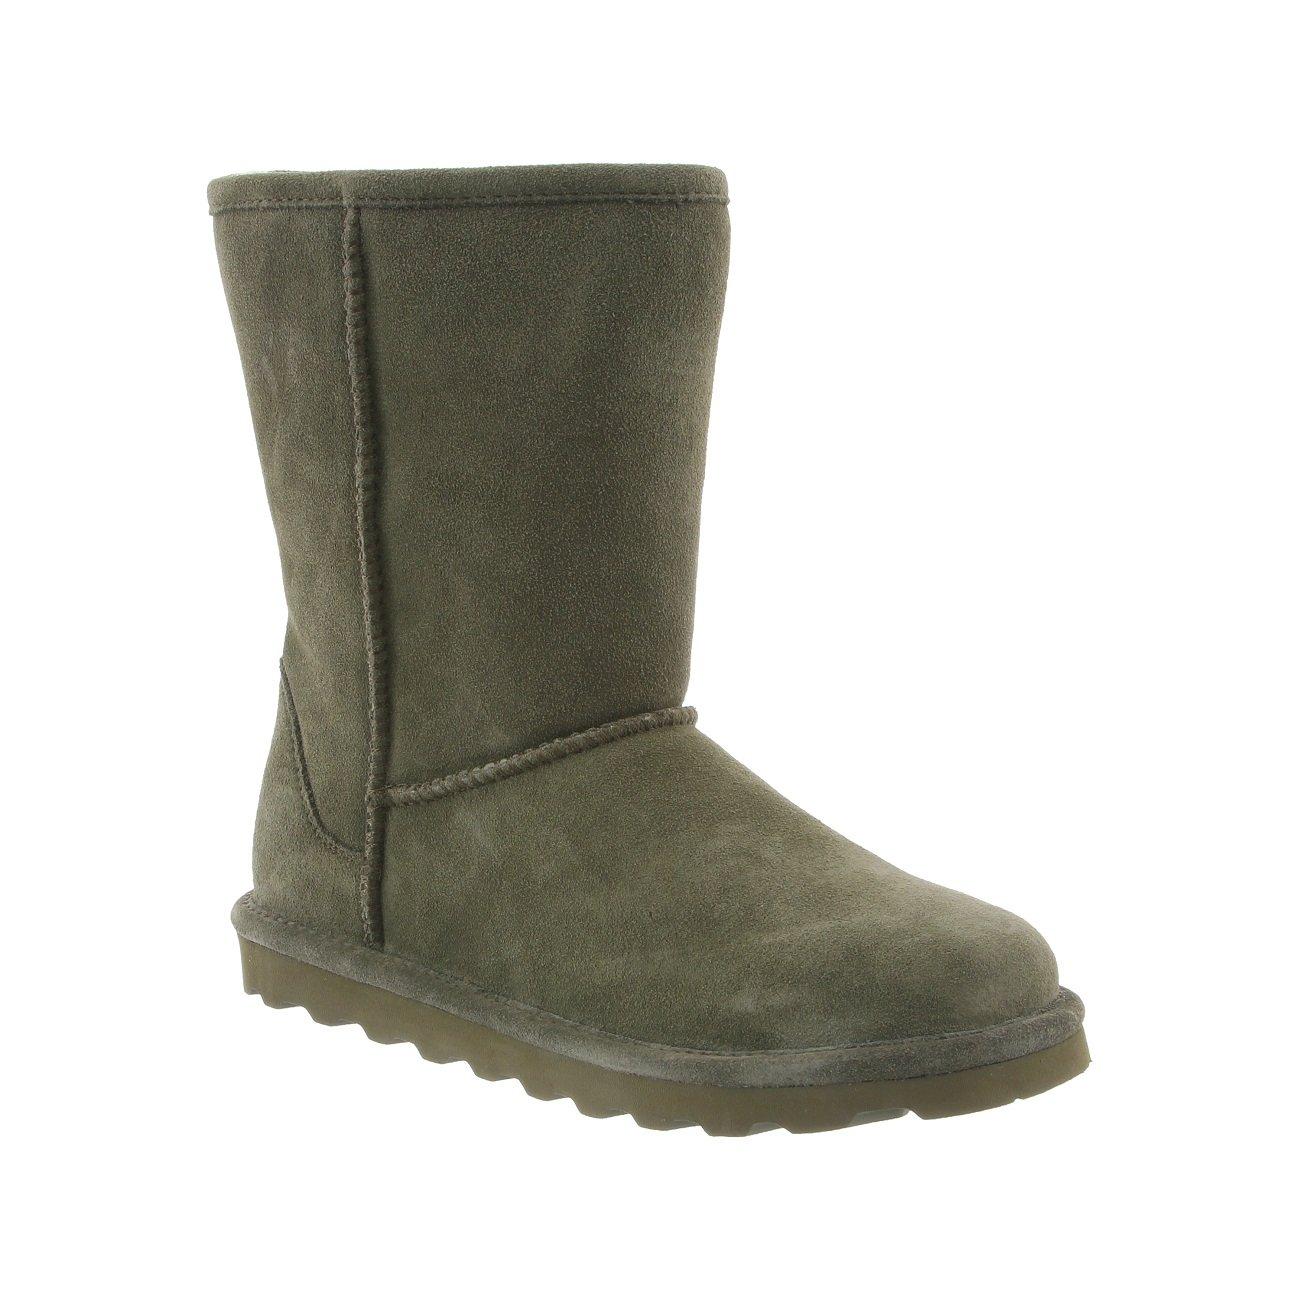 Olive Bearpaw Women's Elle Short Winter Boot